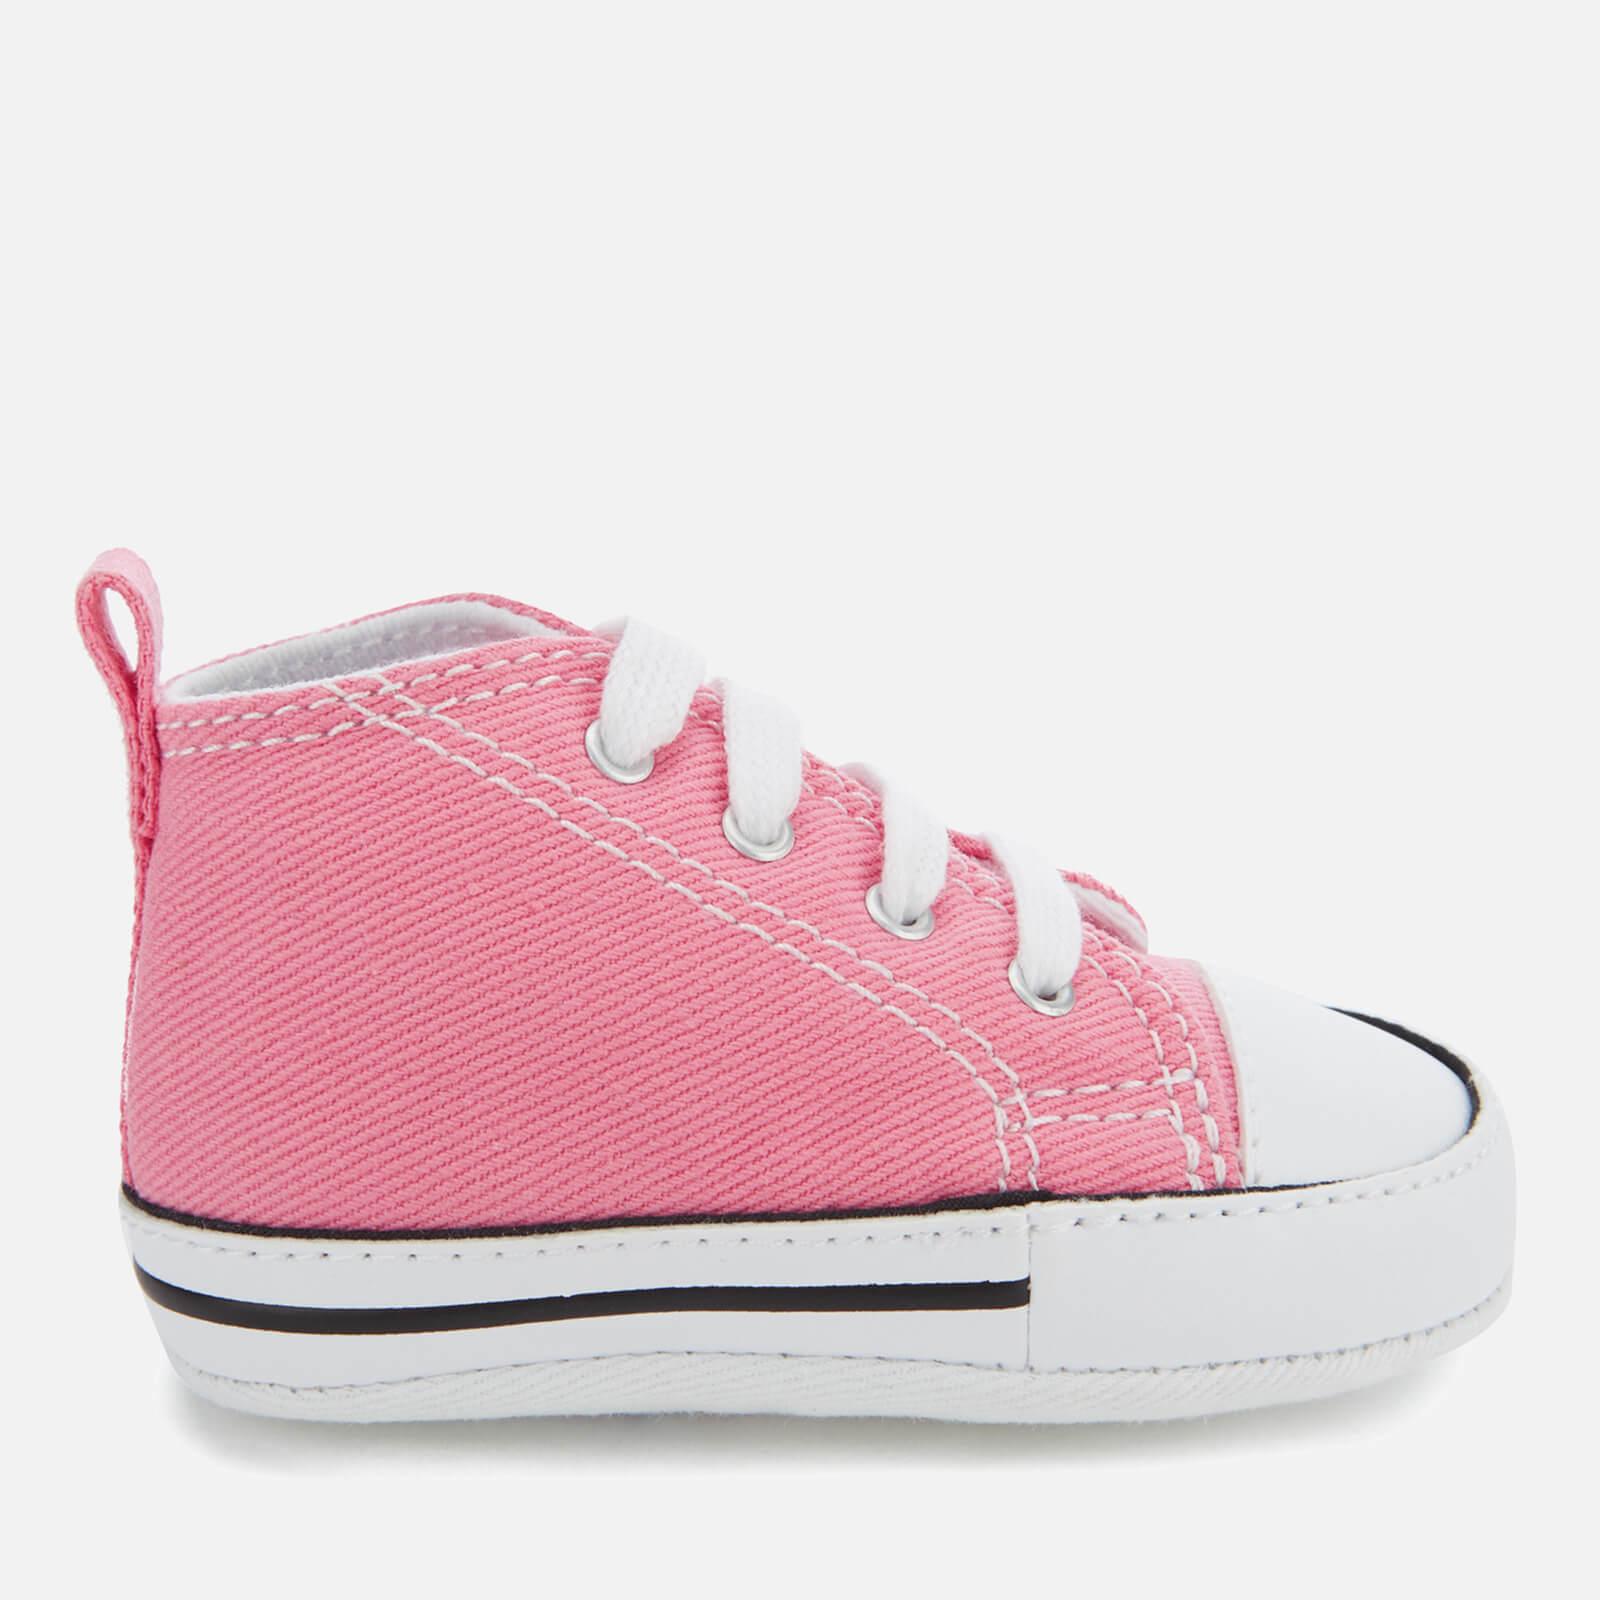 Inmersión Retirarse marca  Converse Babies Chuck Taylor First Star Hi-Top Trainers - Pink | TheHut.com